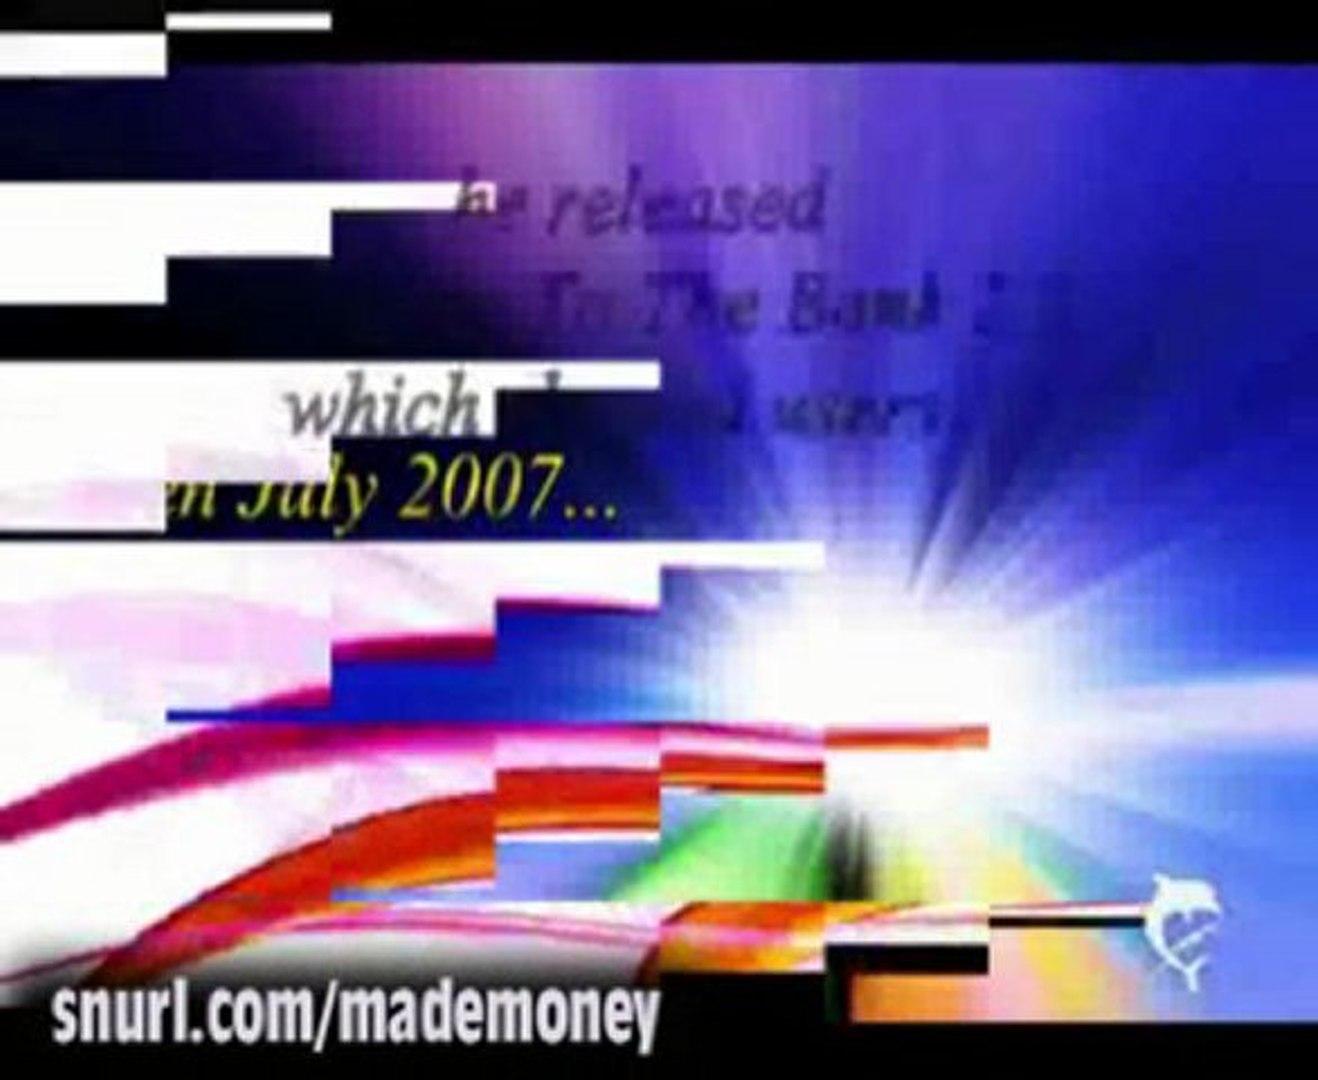 Make Money - Make Money Online Free|Earn Extra Money